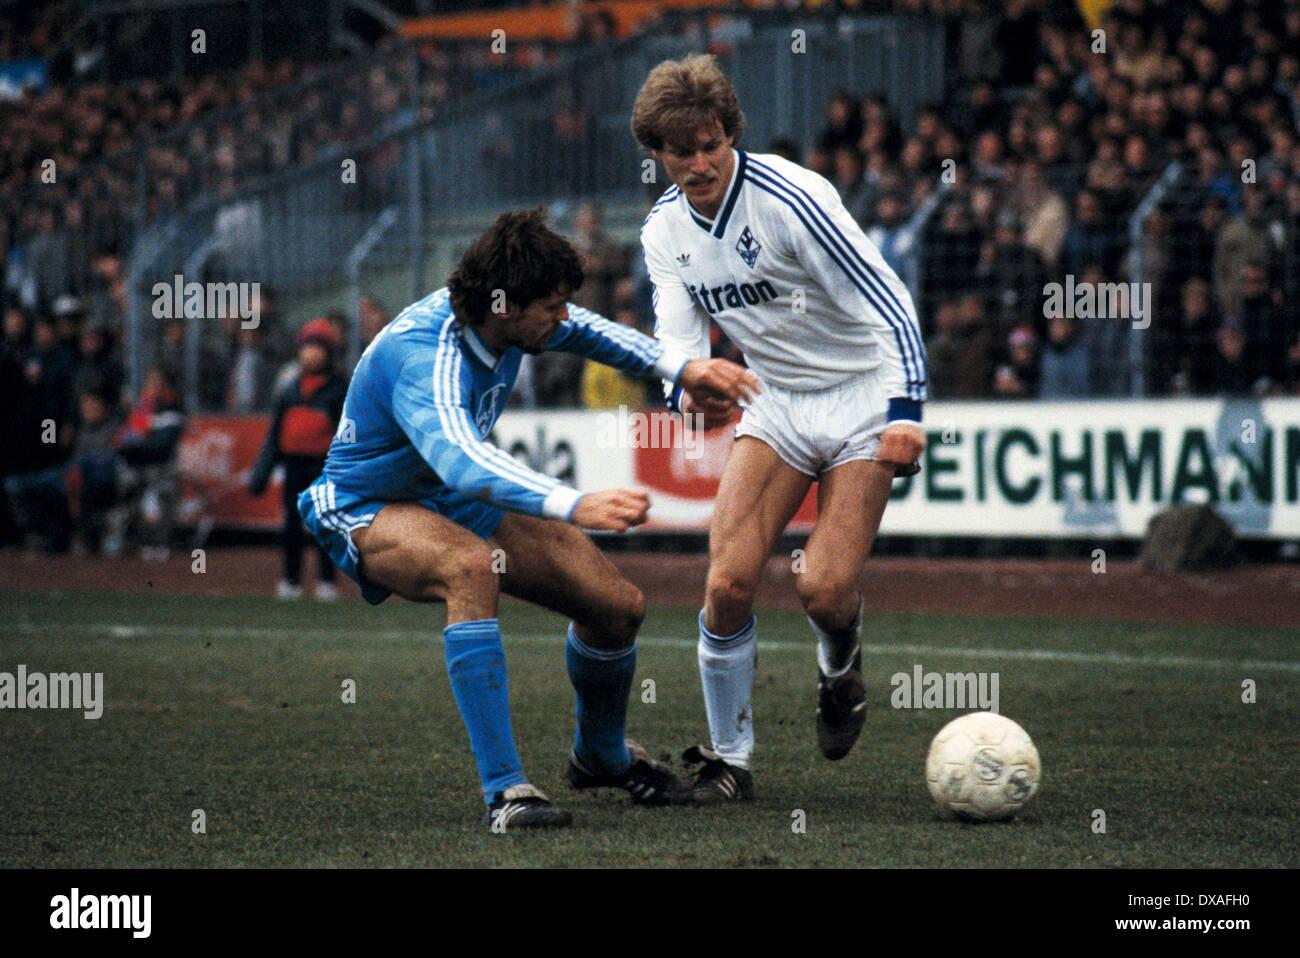 football, Bundesliga, 1984/1985, Grotenburg Stadium, FC Bayer 05 Uerdingen versus SV Waldhof Mannheim 2:2, scene of the match, Alfred Schoen (SVW) in ball possession, left Ludger van de Loo (Bayer) - Stock Image